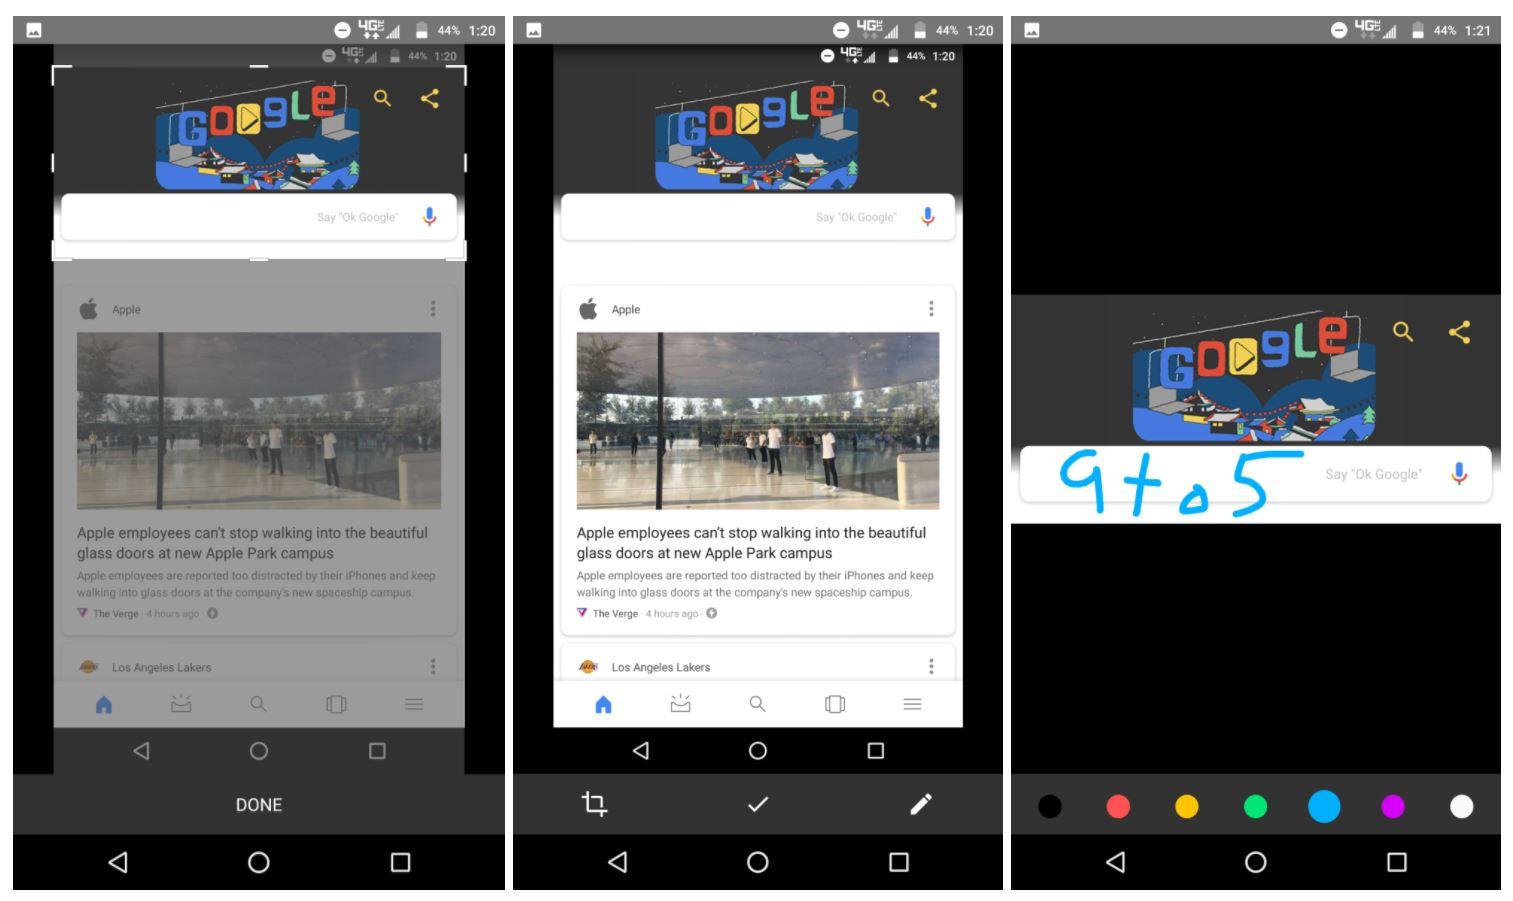 Google App Screenshots Erstellen und Bearbeiten